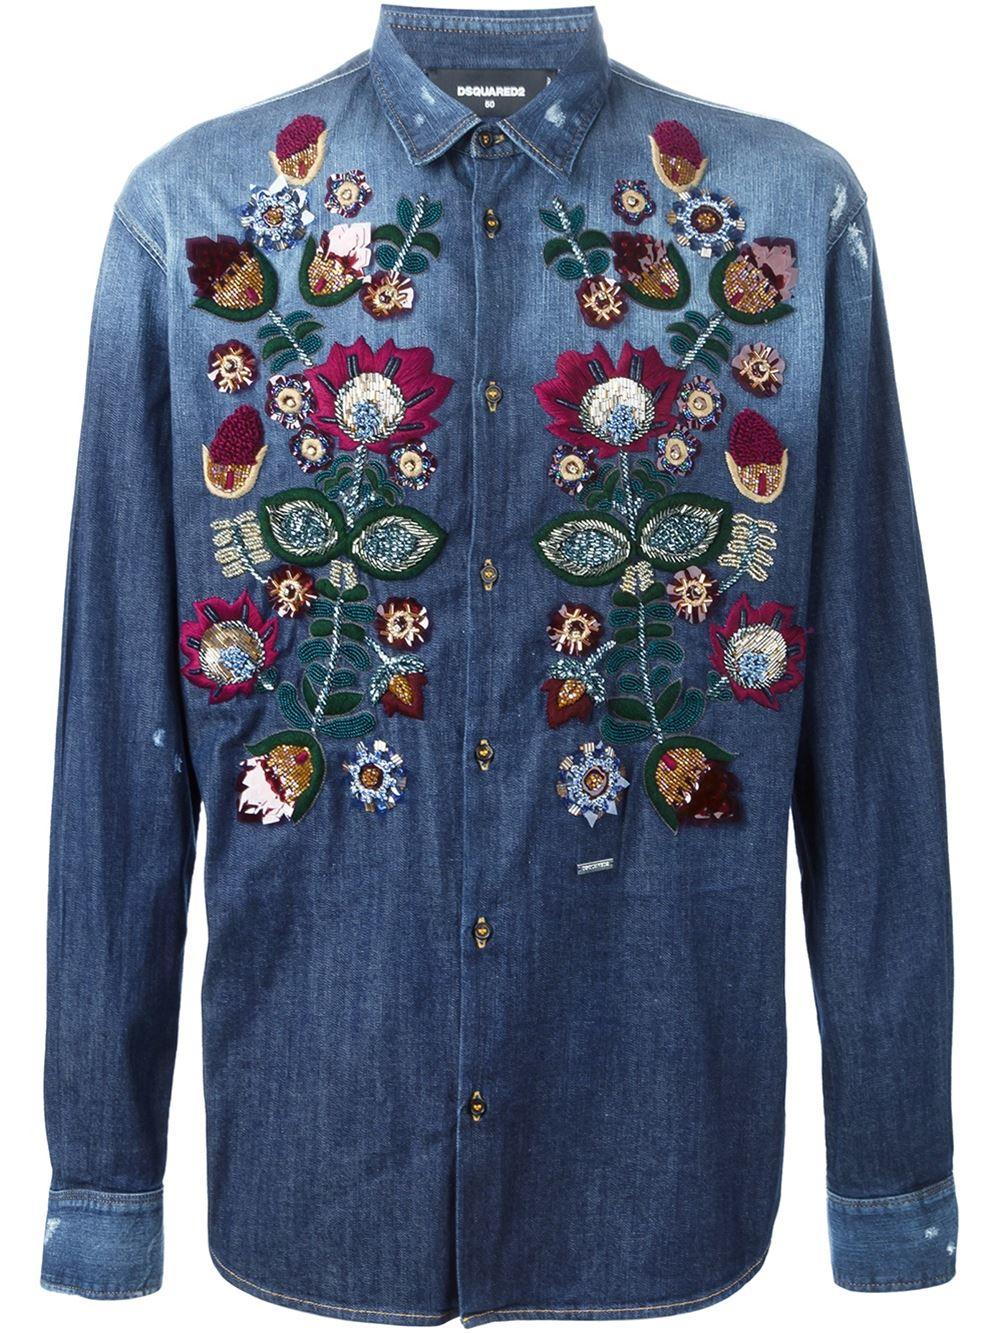 Dsquared² flower embroidered denim shirt in blue for men